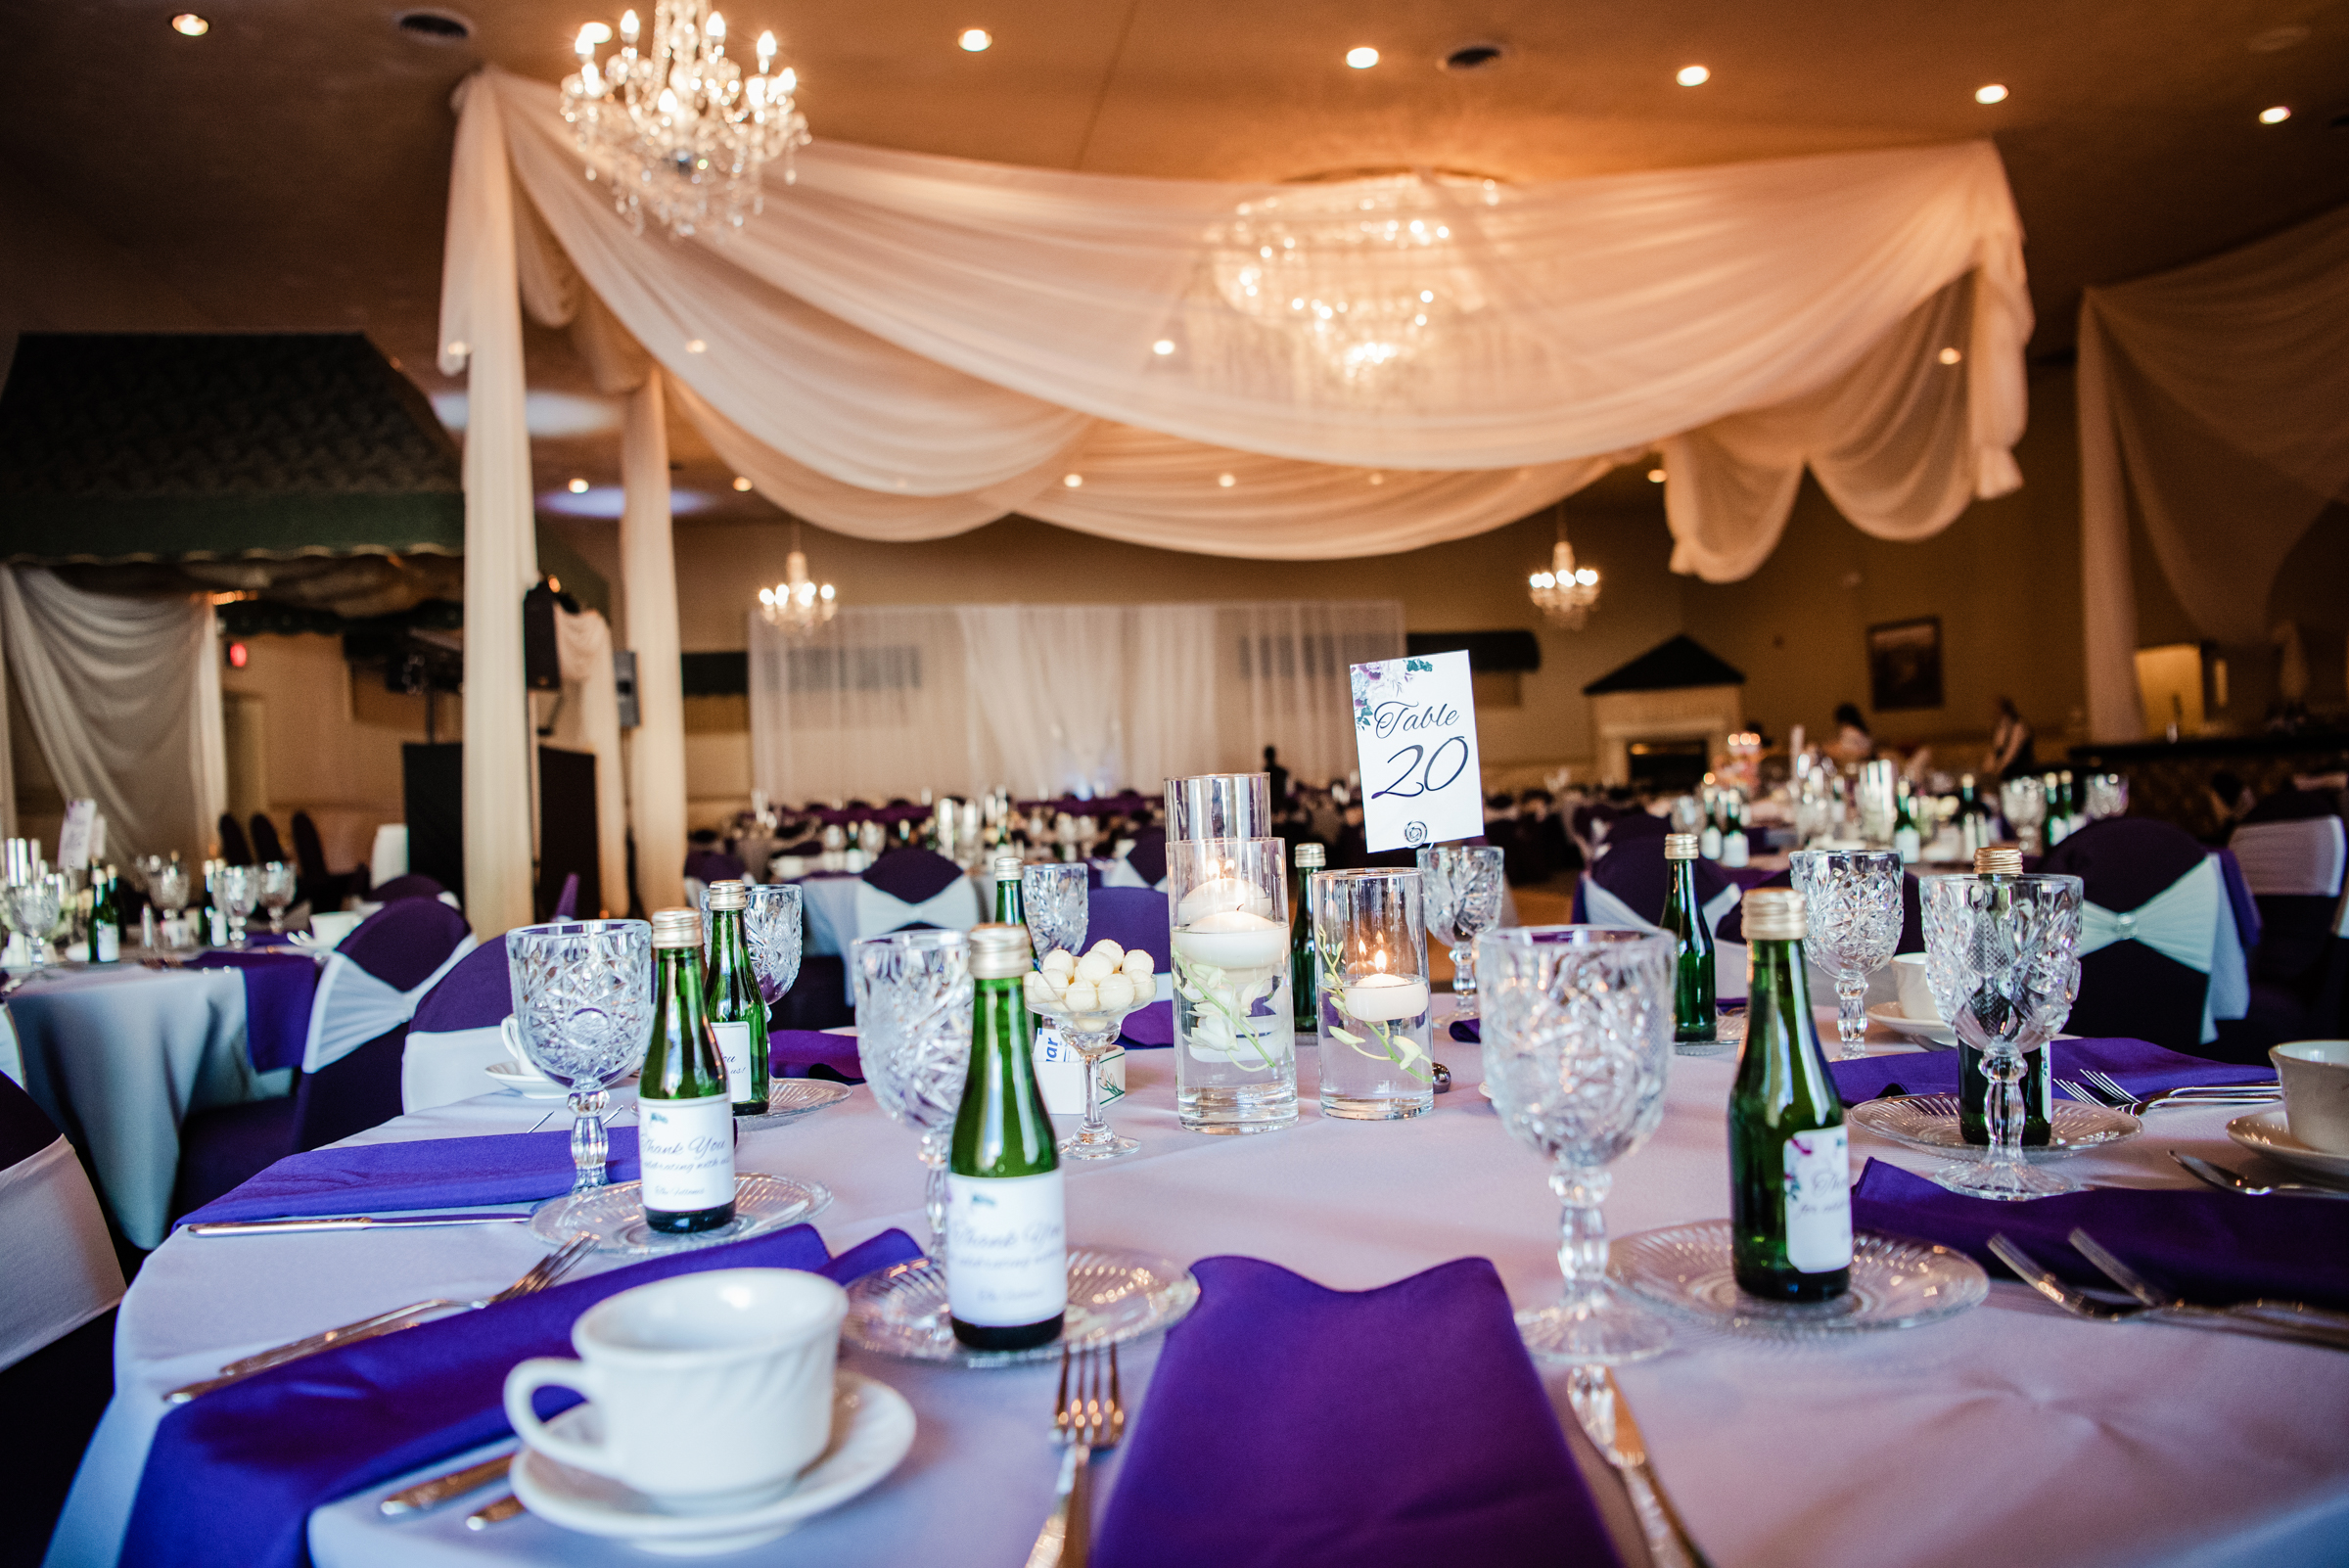 Historic_Old_St_Johns_Church_Valentinos_Banquet_Hall_Central_NY_Wedding_JILL_STUDIO_Rochester_NY_Photographer_DSC_6502.jpg